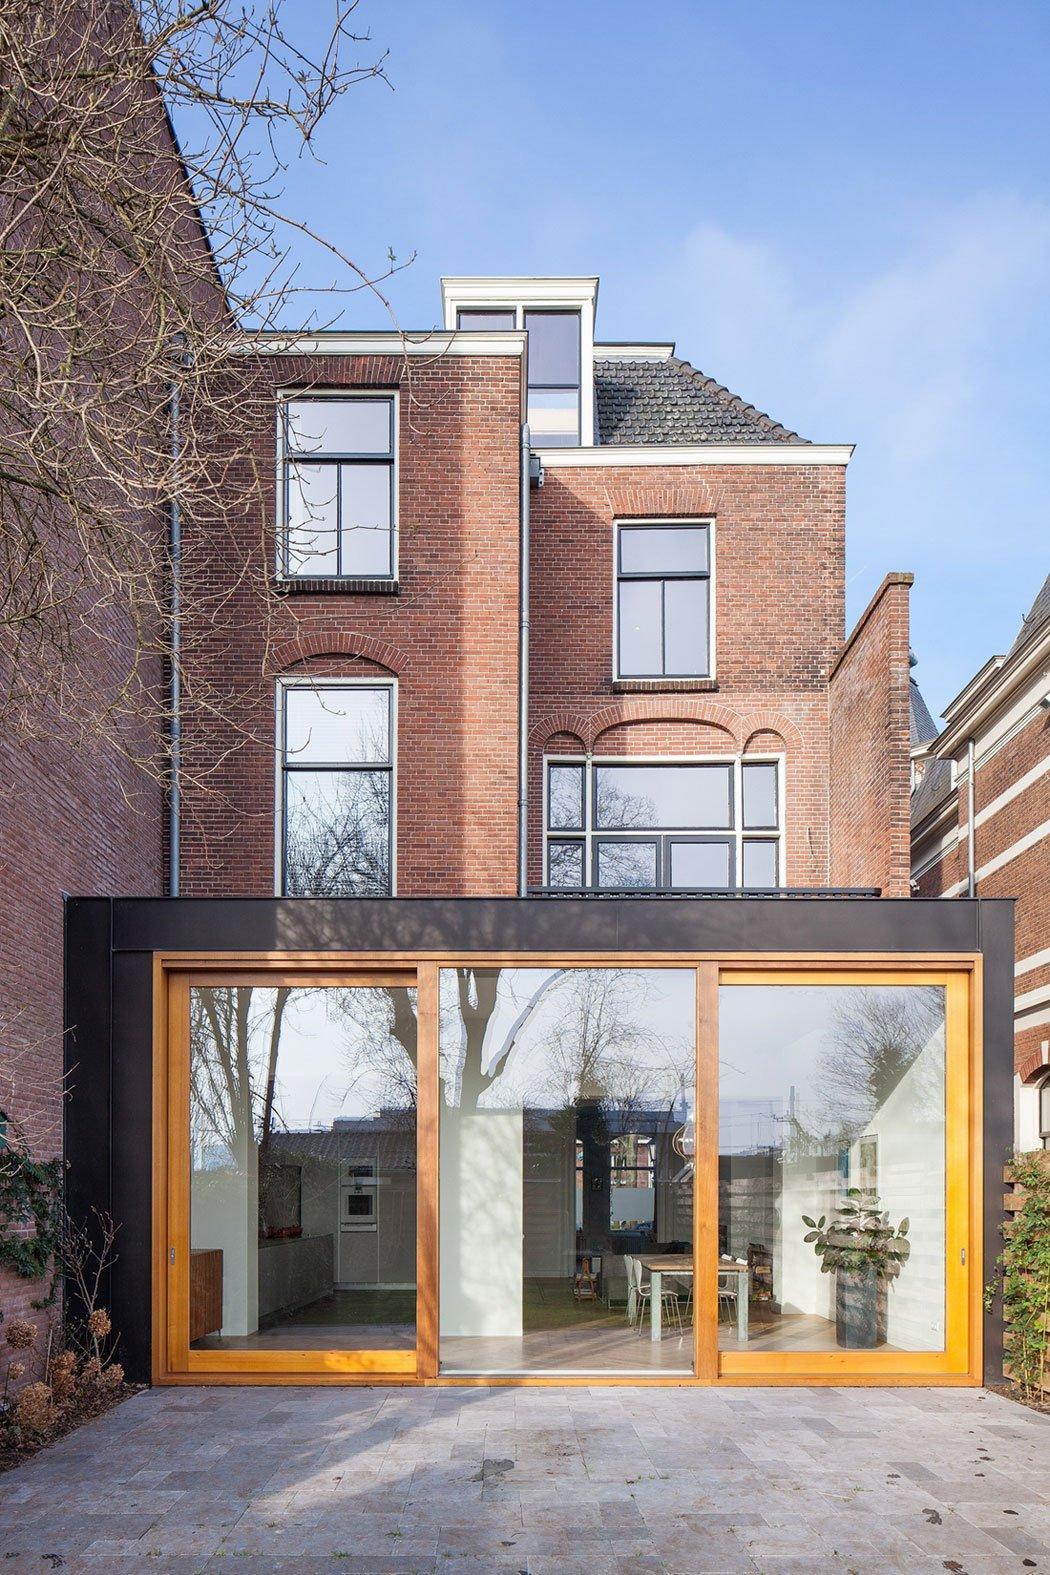 Extension-Maliebaan-Utrecht-01